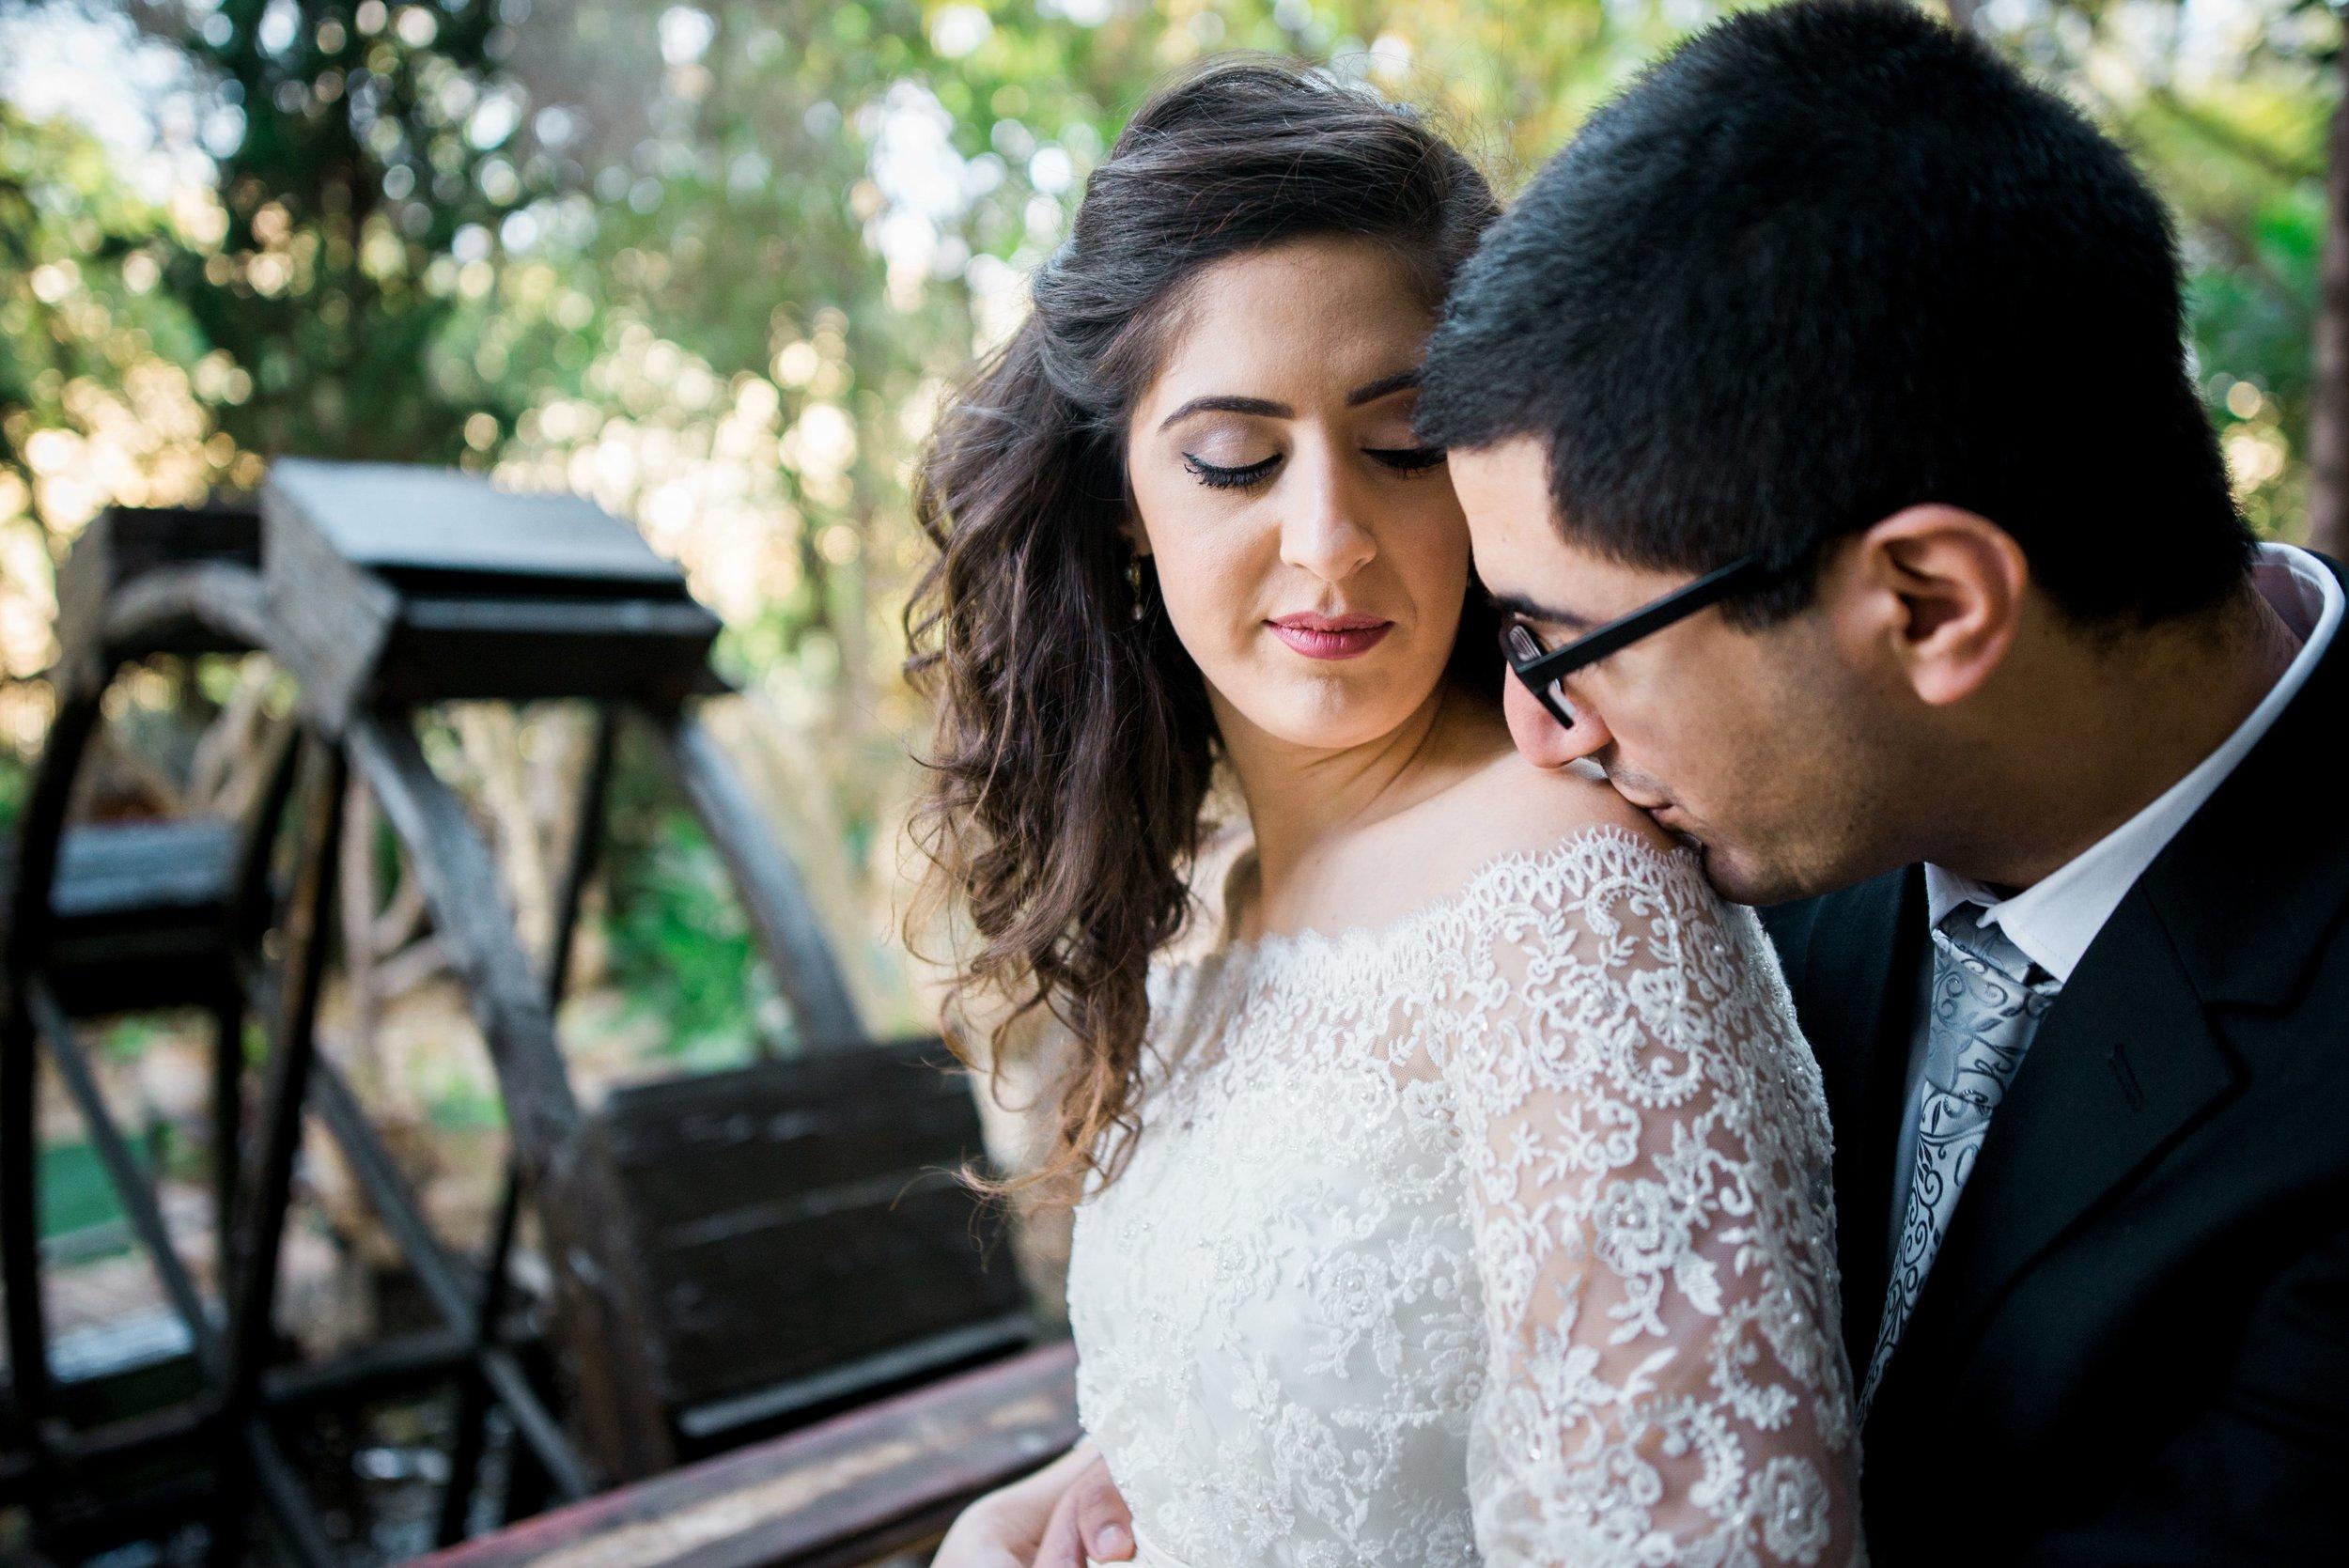 israel-garden-wedding-portraits-session-kate-giryes-photography--18_WEB.jpg